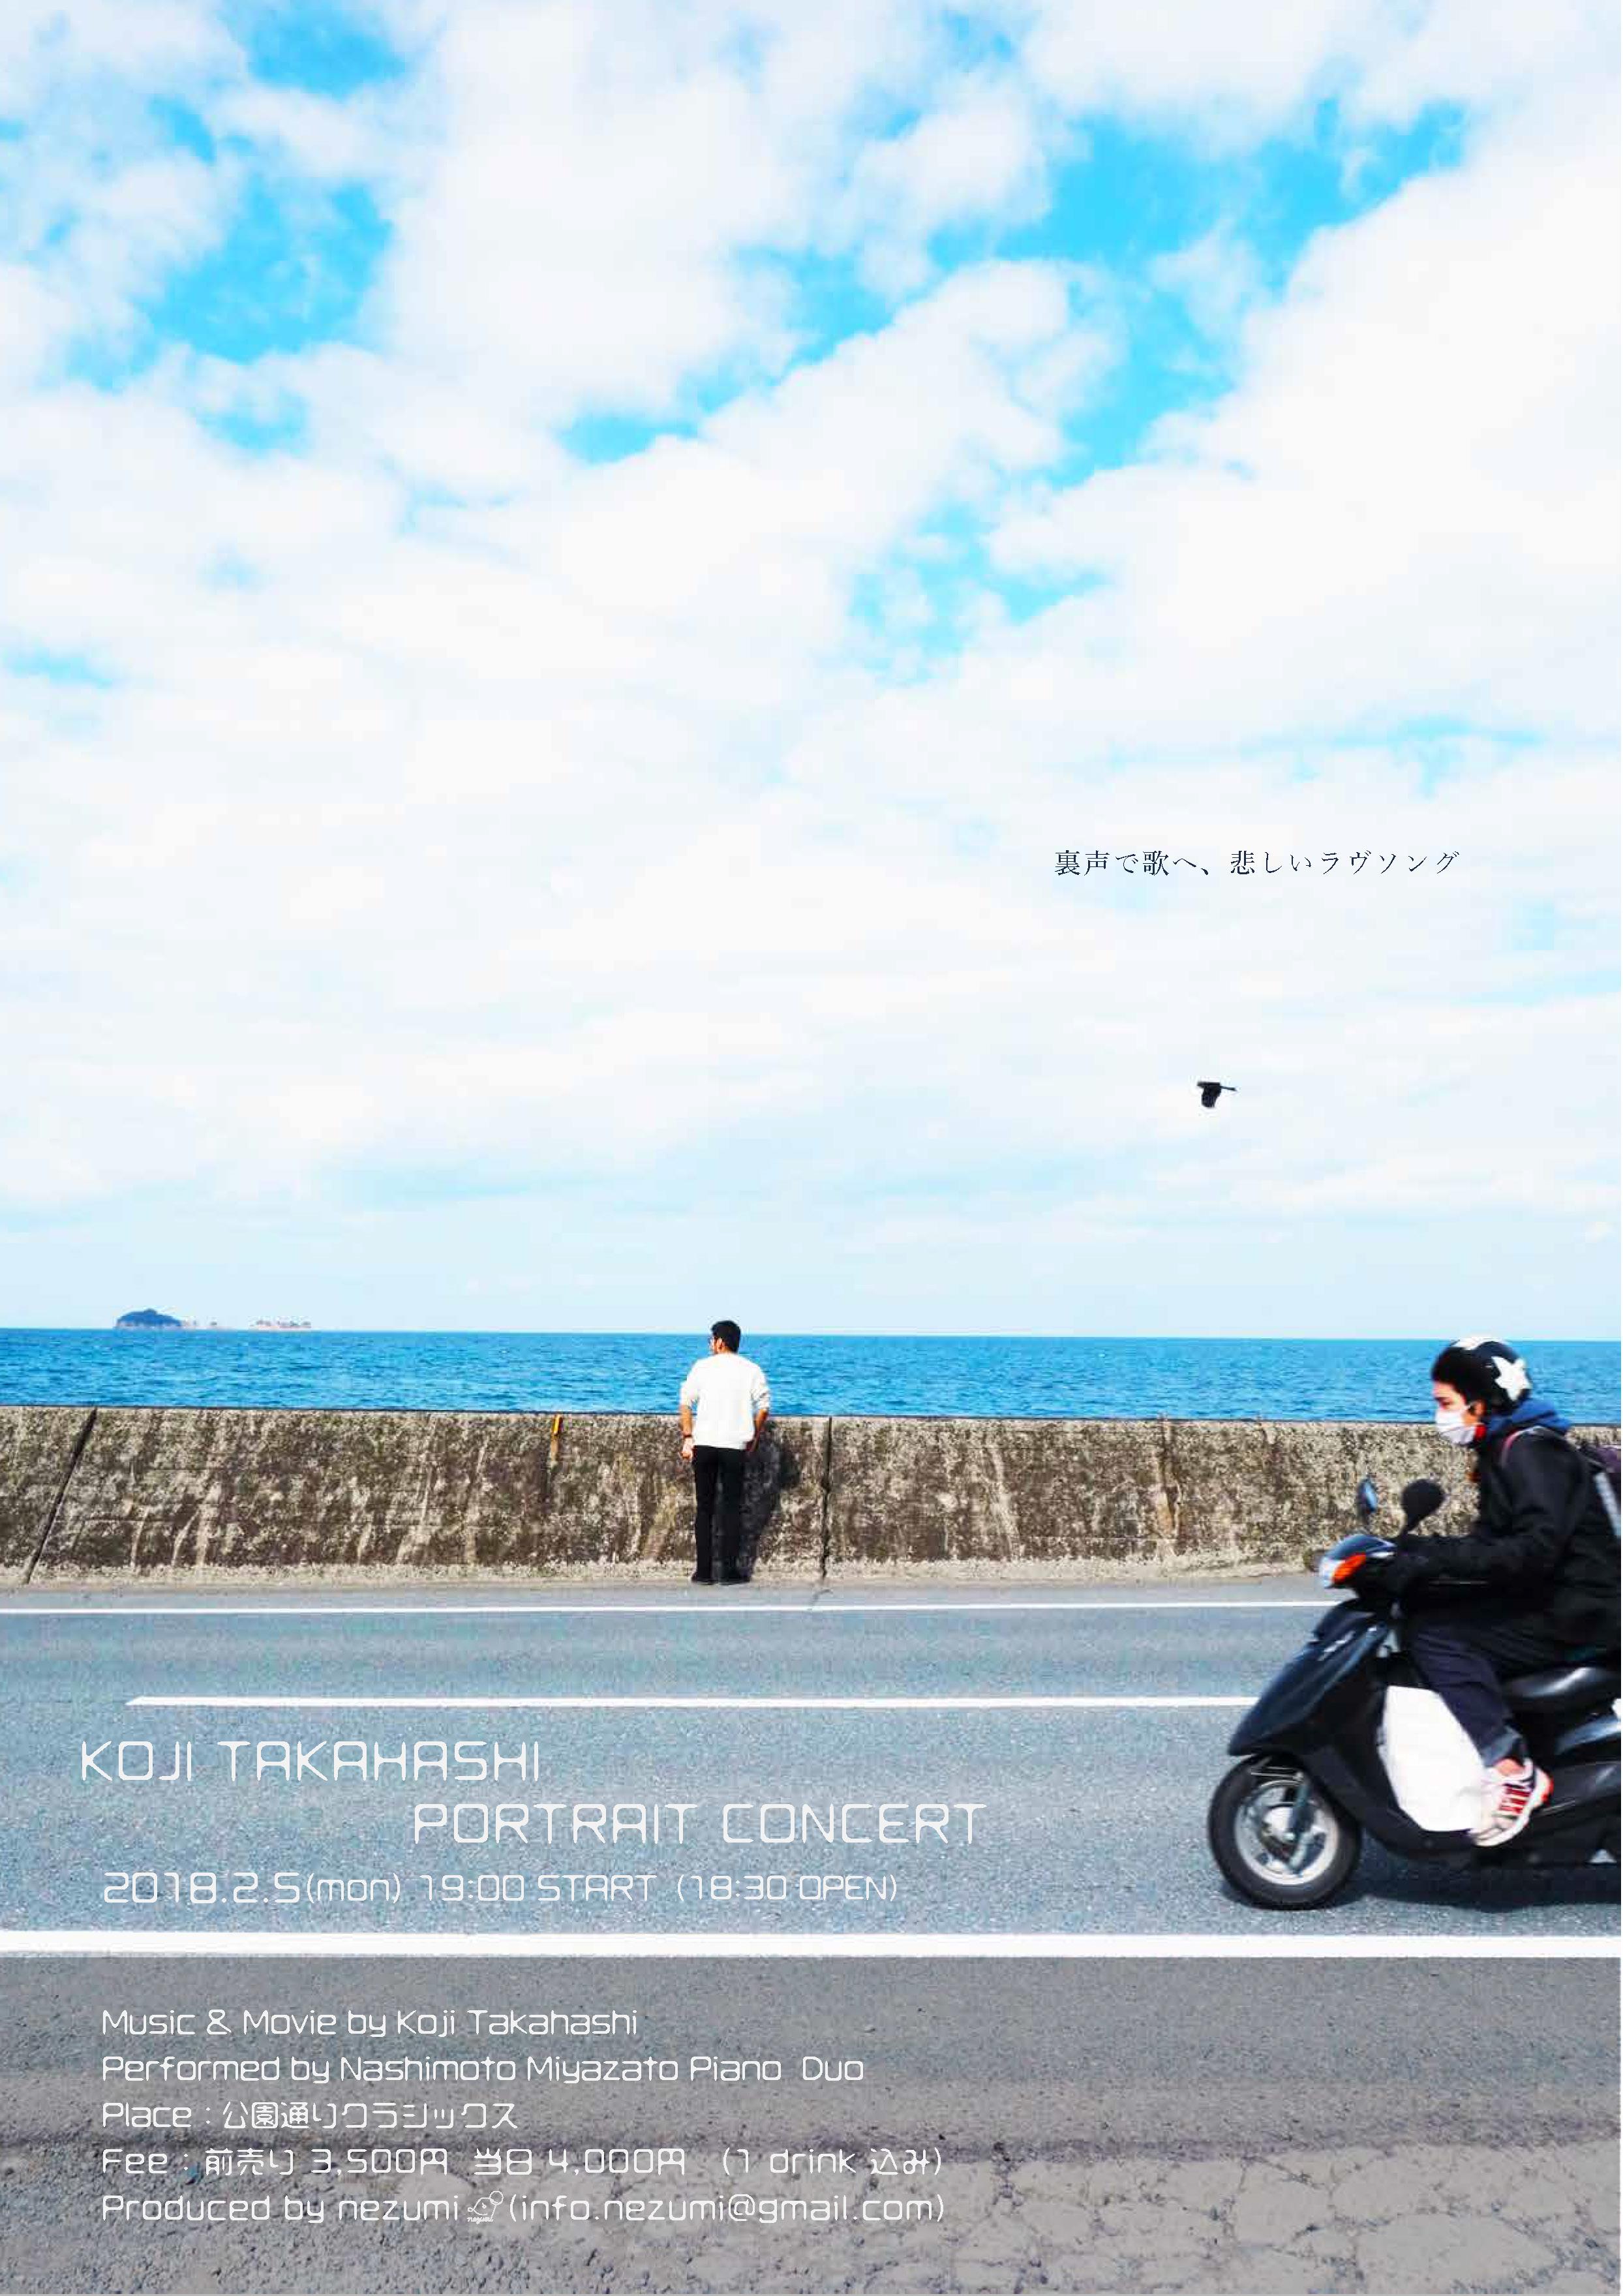 KOJI TAKAHASHI PORTRAIT CONCERT −裏声で歌へ、悲しいラヴソング